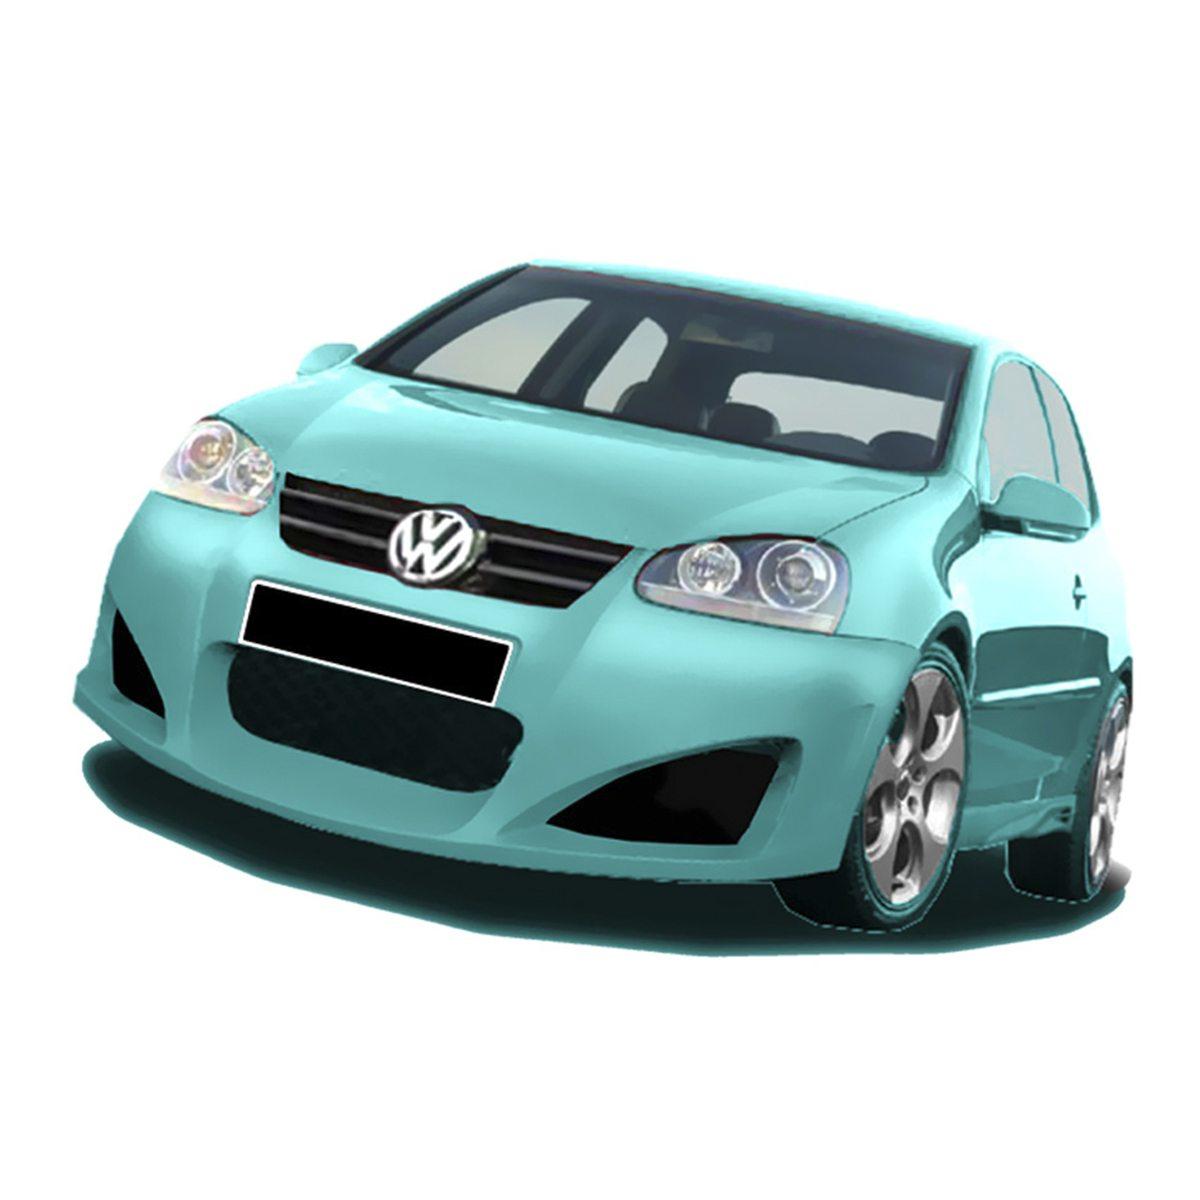 VW-Golf-V-Ghost-II-Frt-PCU1115.1